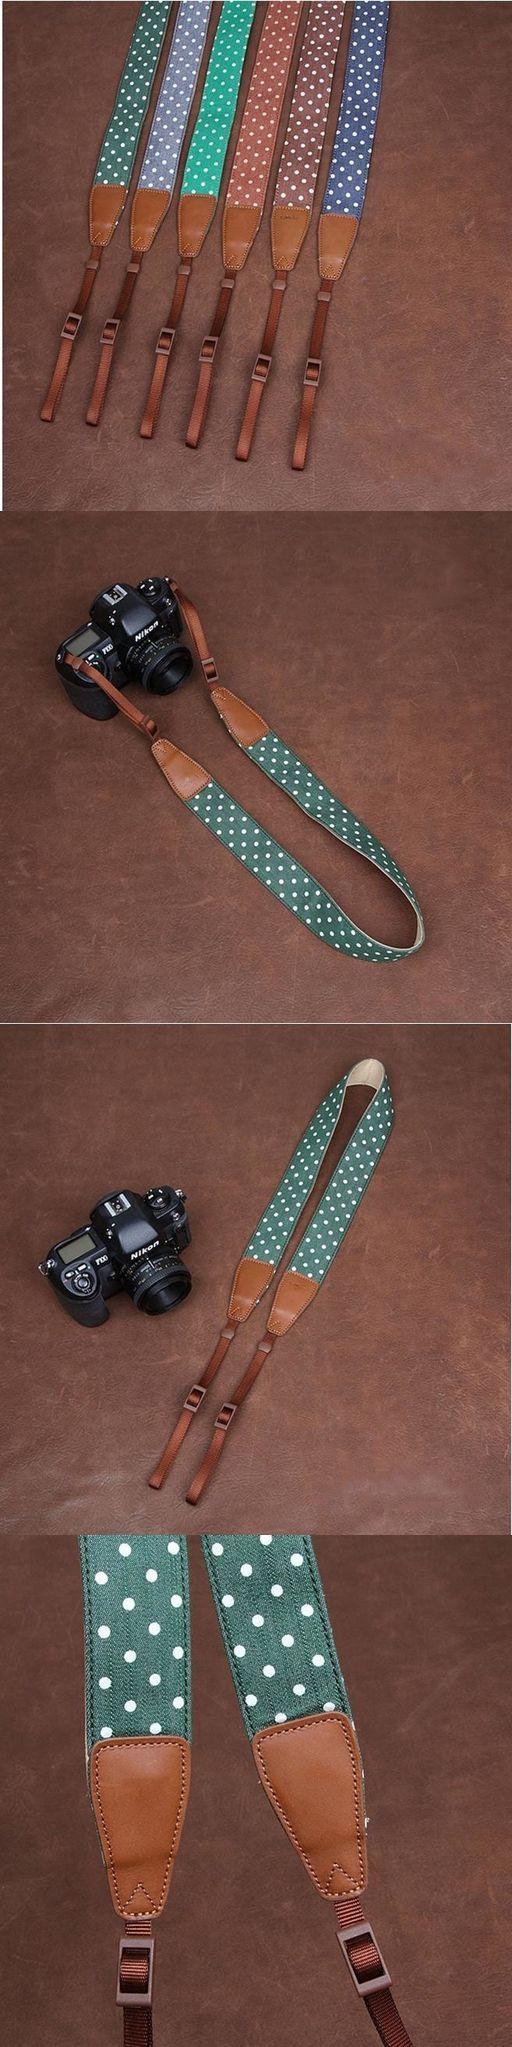 White lovely dot Handmade Leather DSLR Camera Strap Canon/Nikon Camera Strap 7177 by i-cam